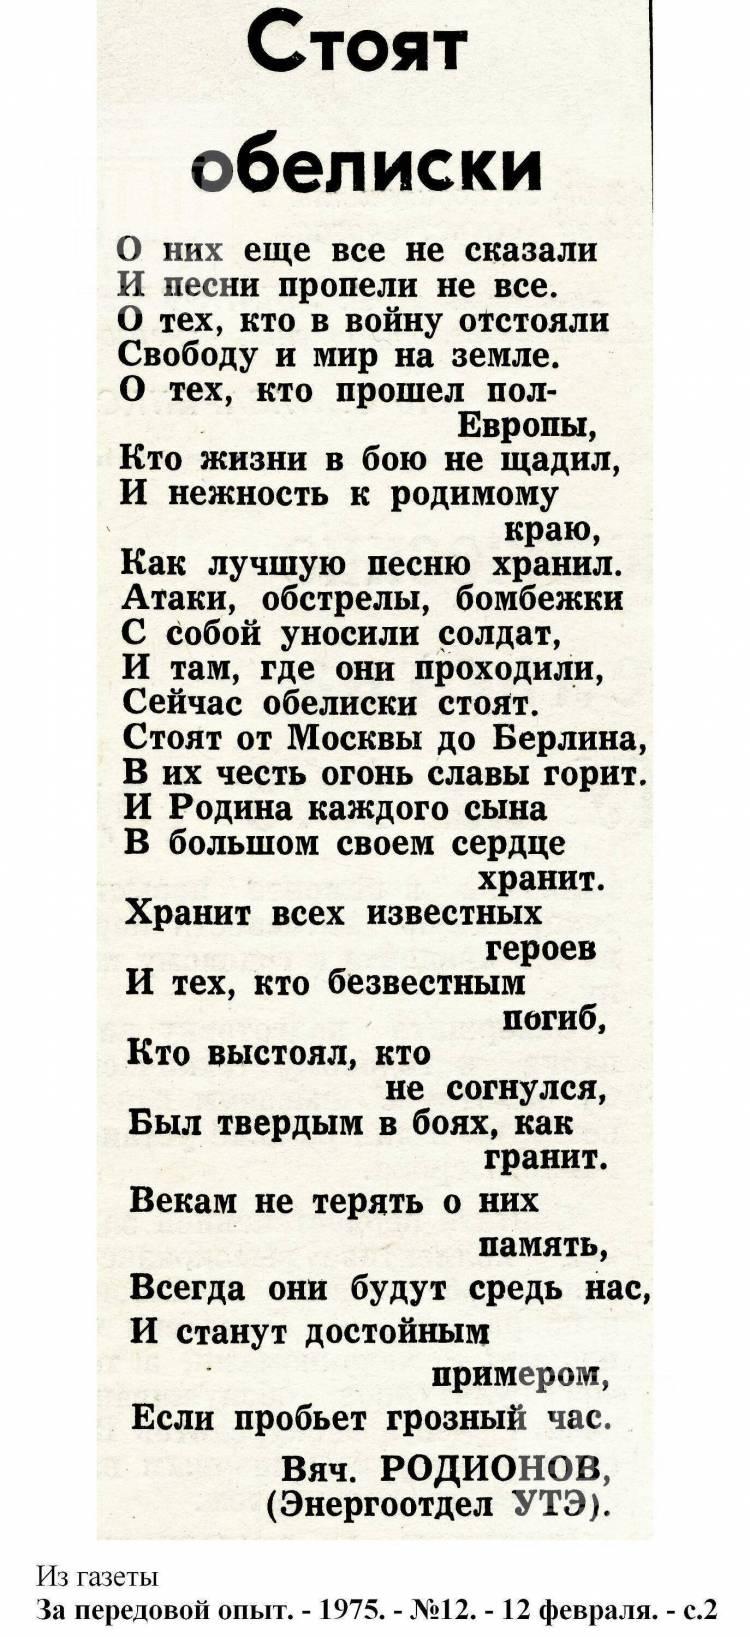 """Стоят обелиски"". 1975, №12"